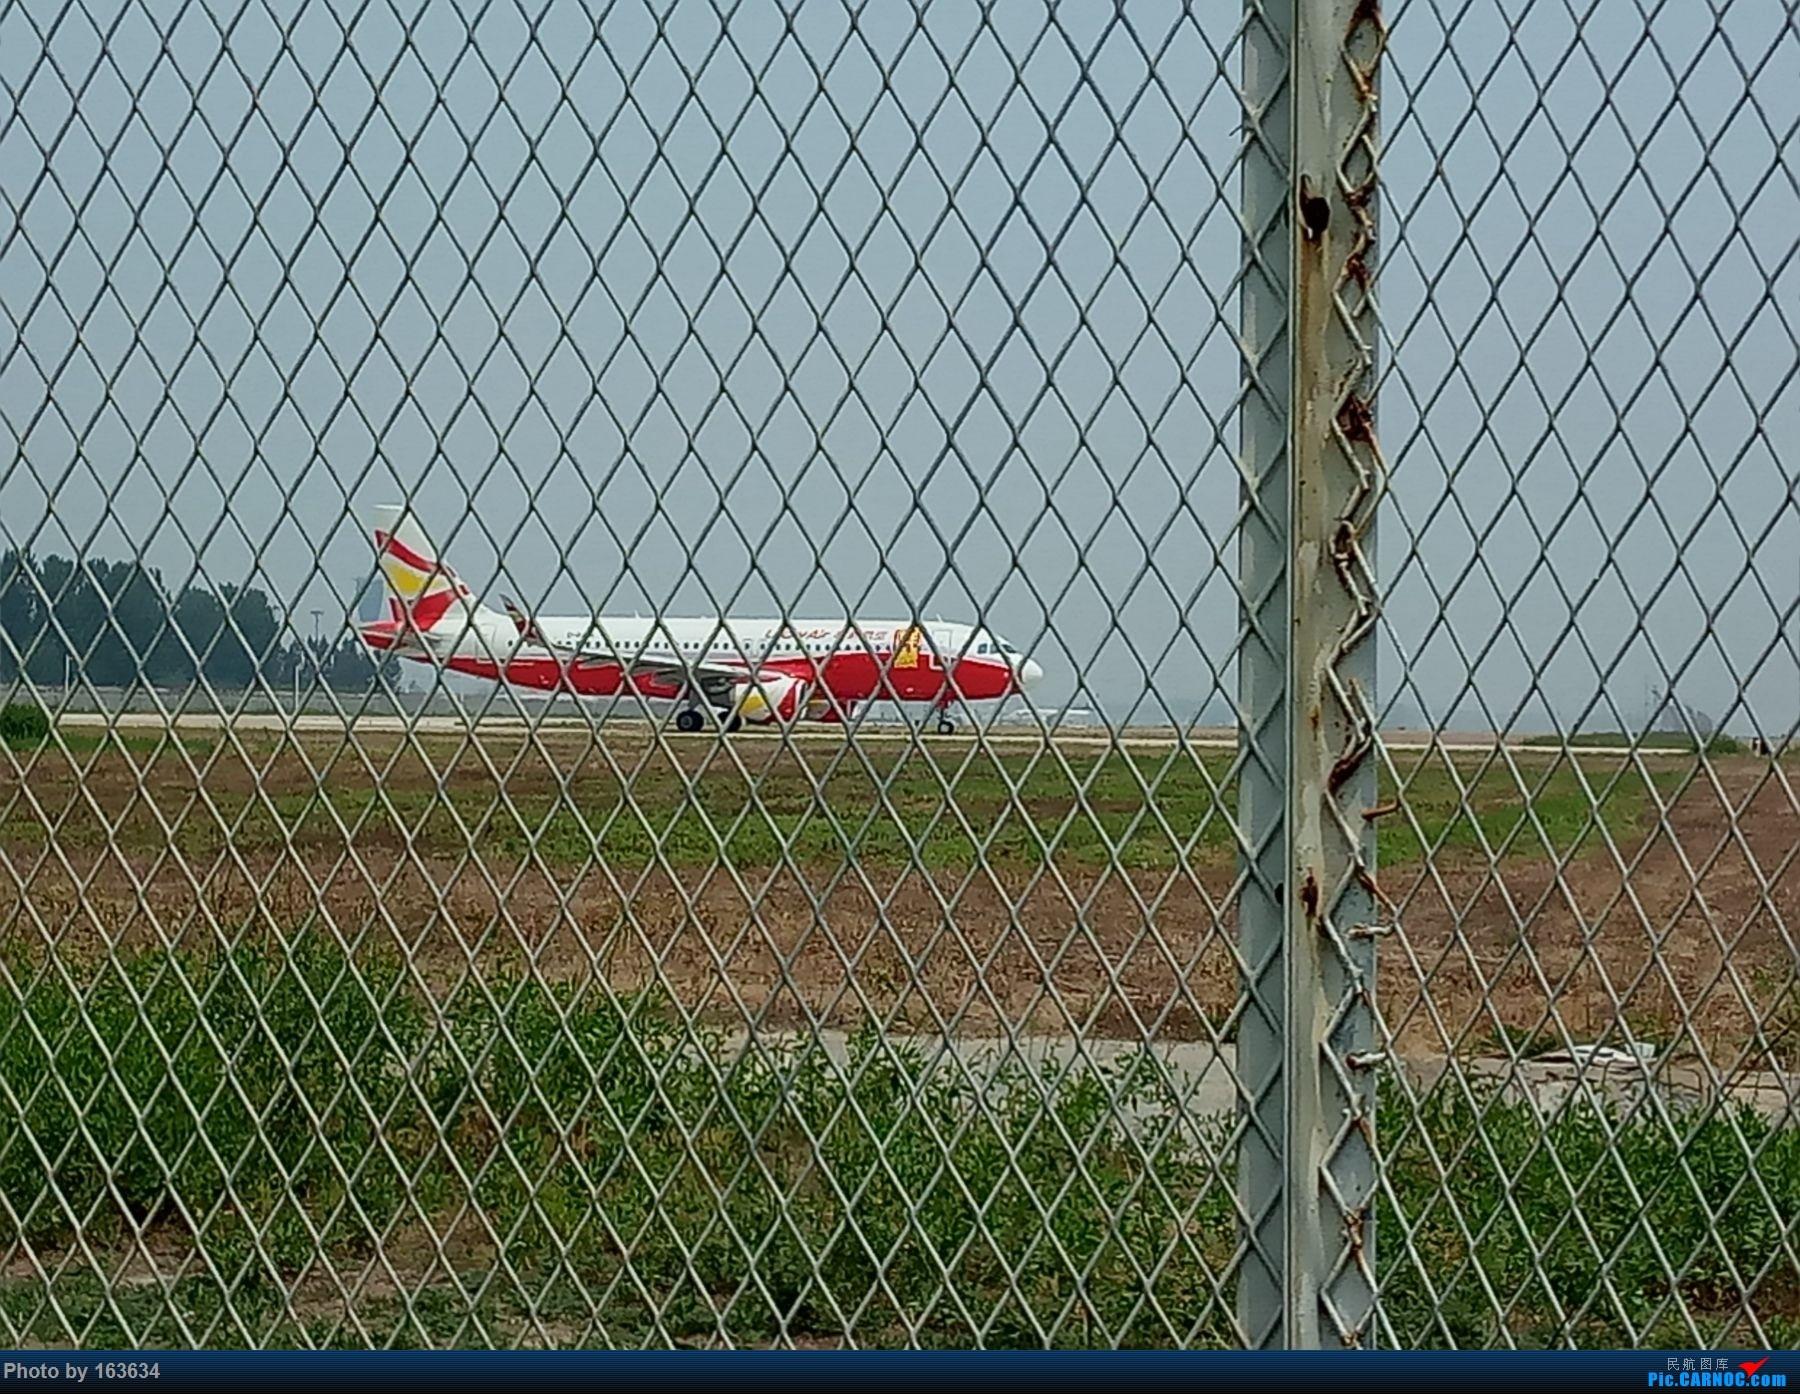 Re:[原创]第九次济南拍机。。。(对不起大家,上海的图还没来得及处理,大家先看看济南的吧) AIRBUS A320-200